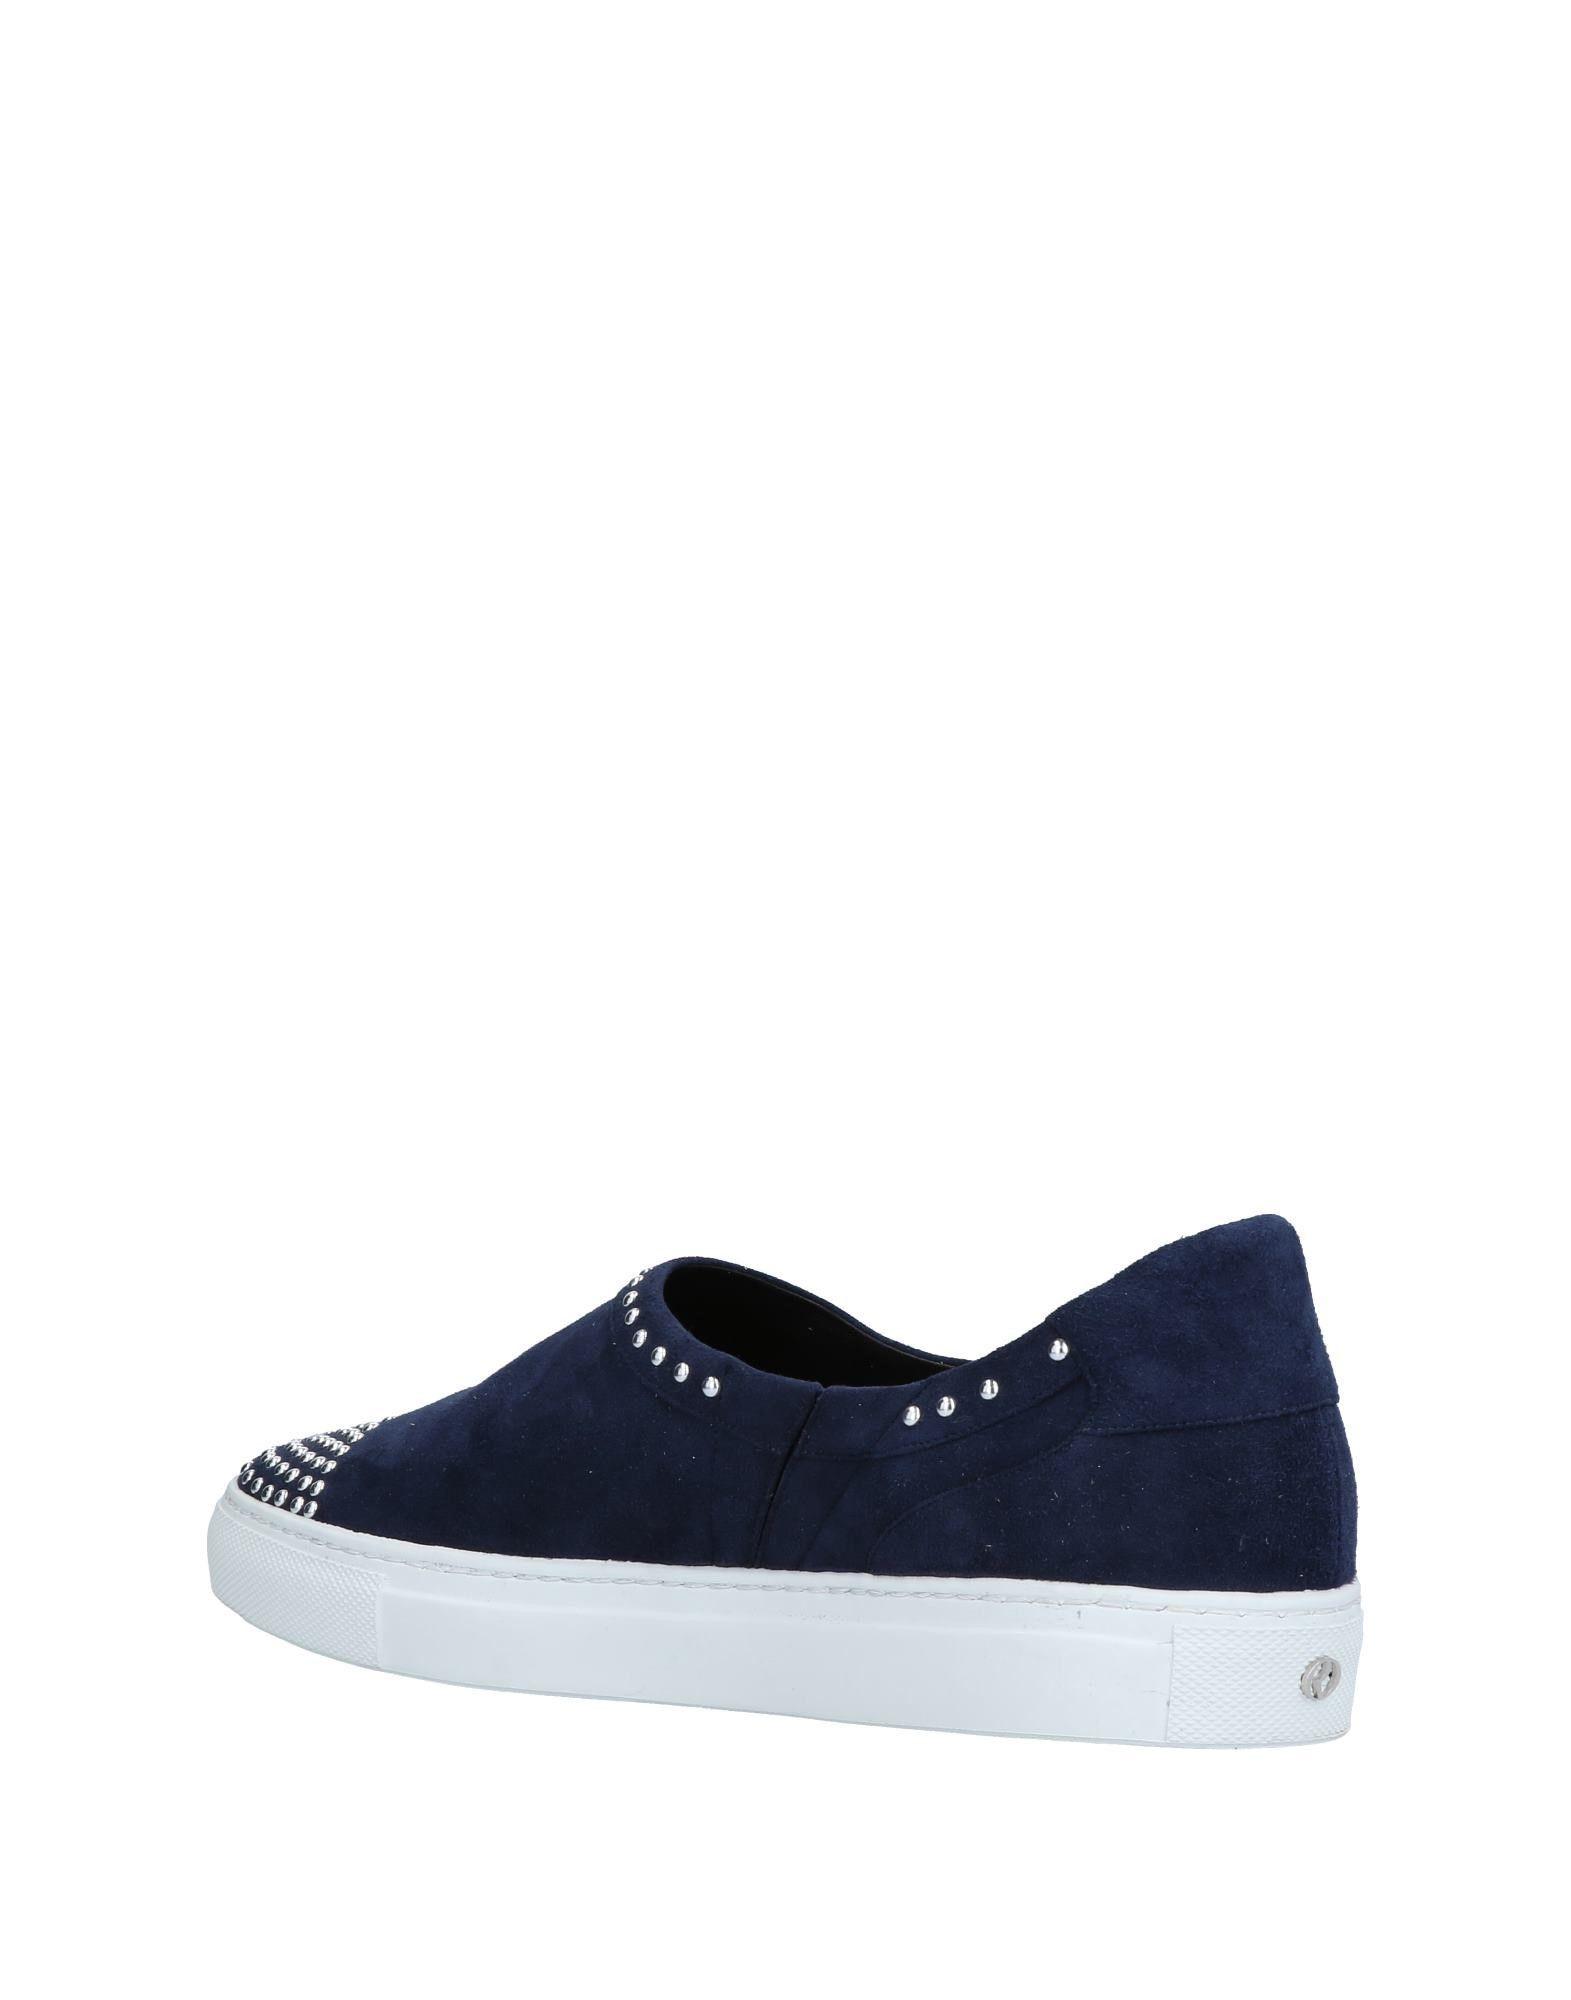 Rodo aussehende Sneakers Damen  11503504NVGut aussehende Rodo strapazierfähige Schuhe f568a3